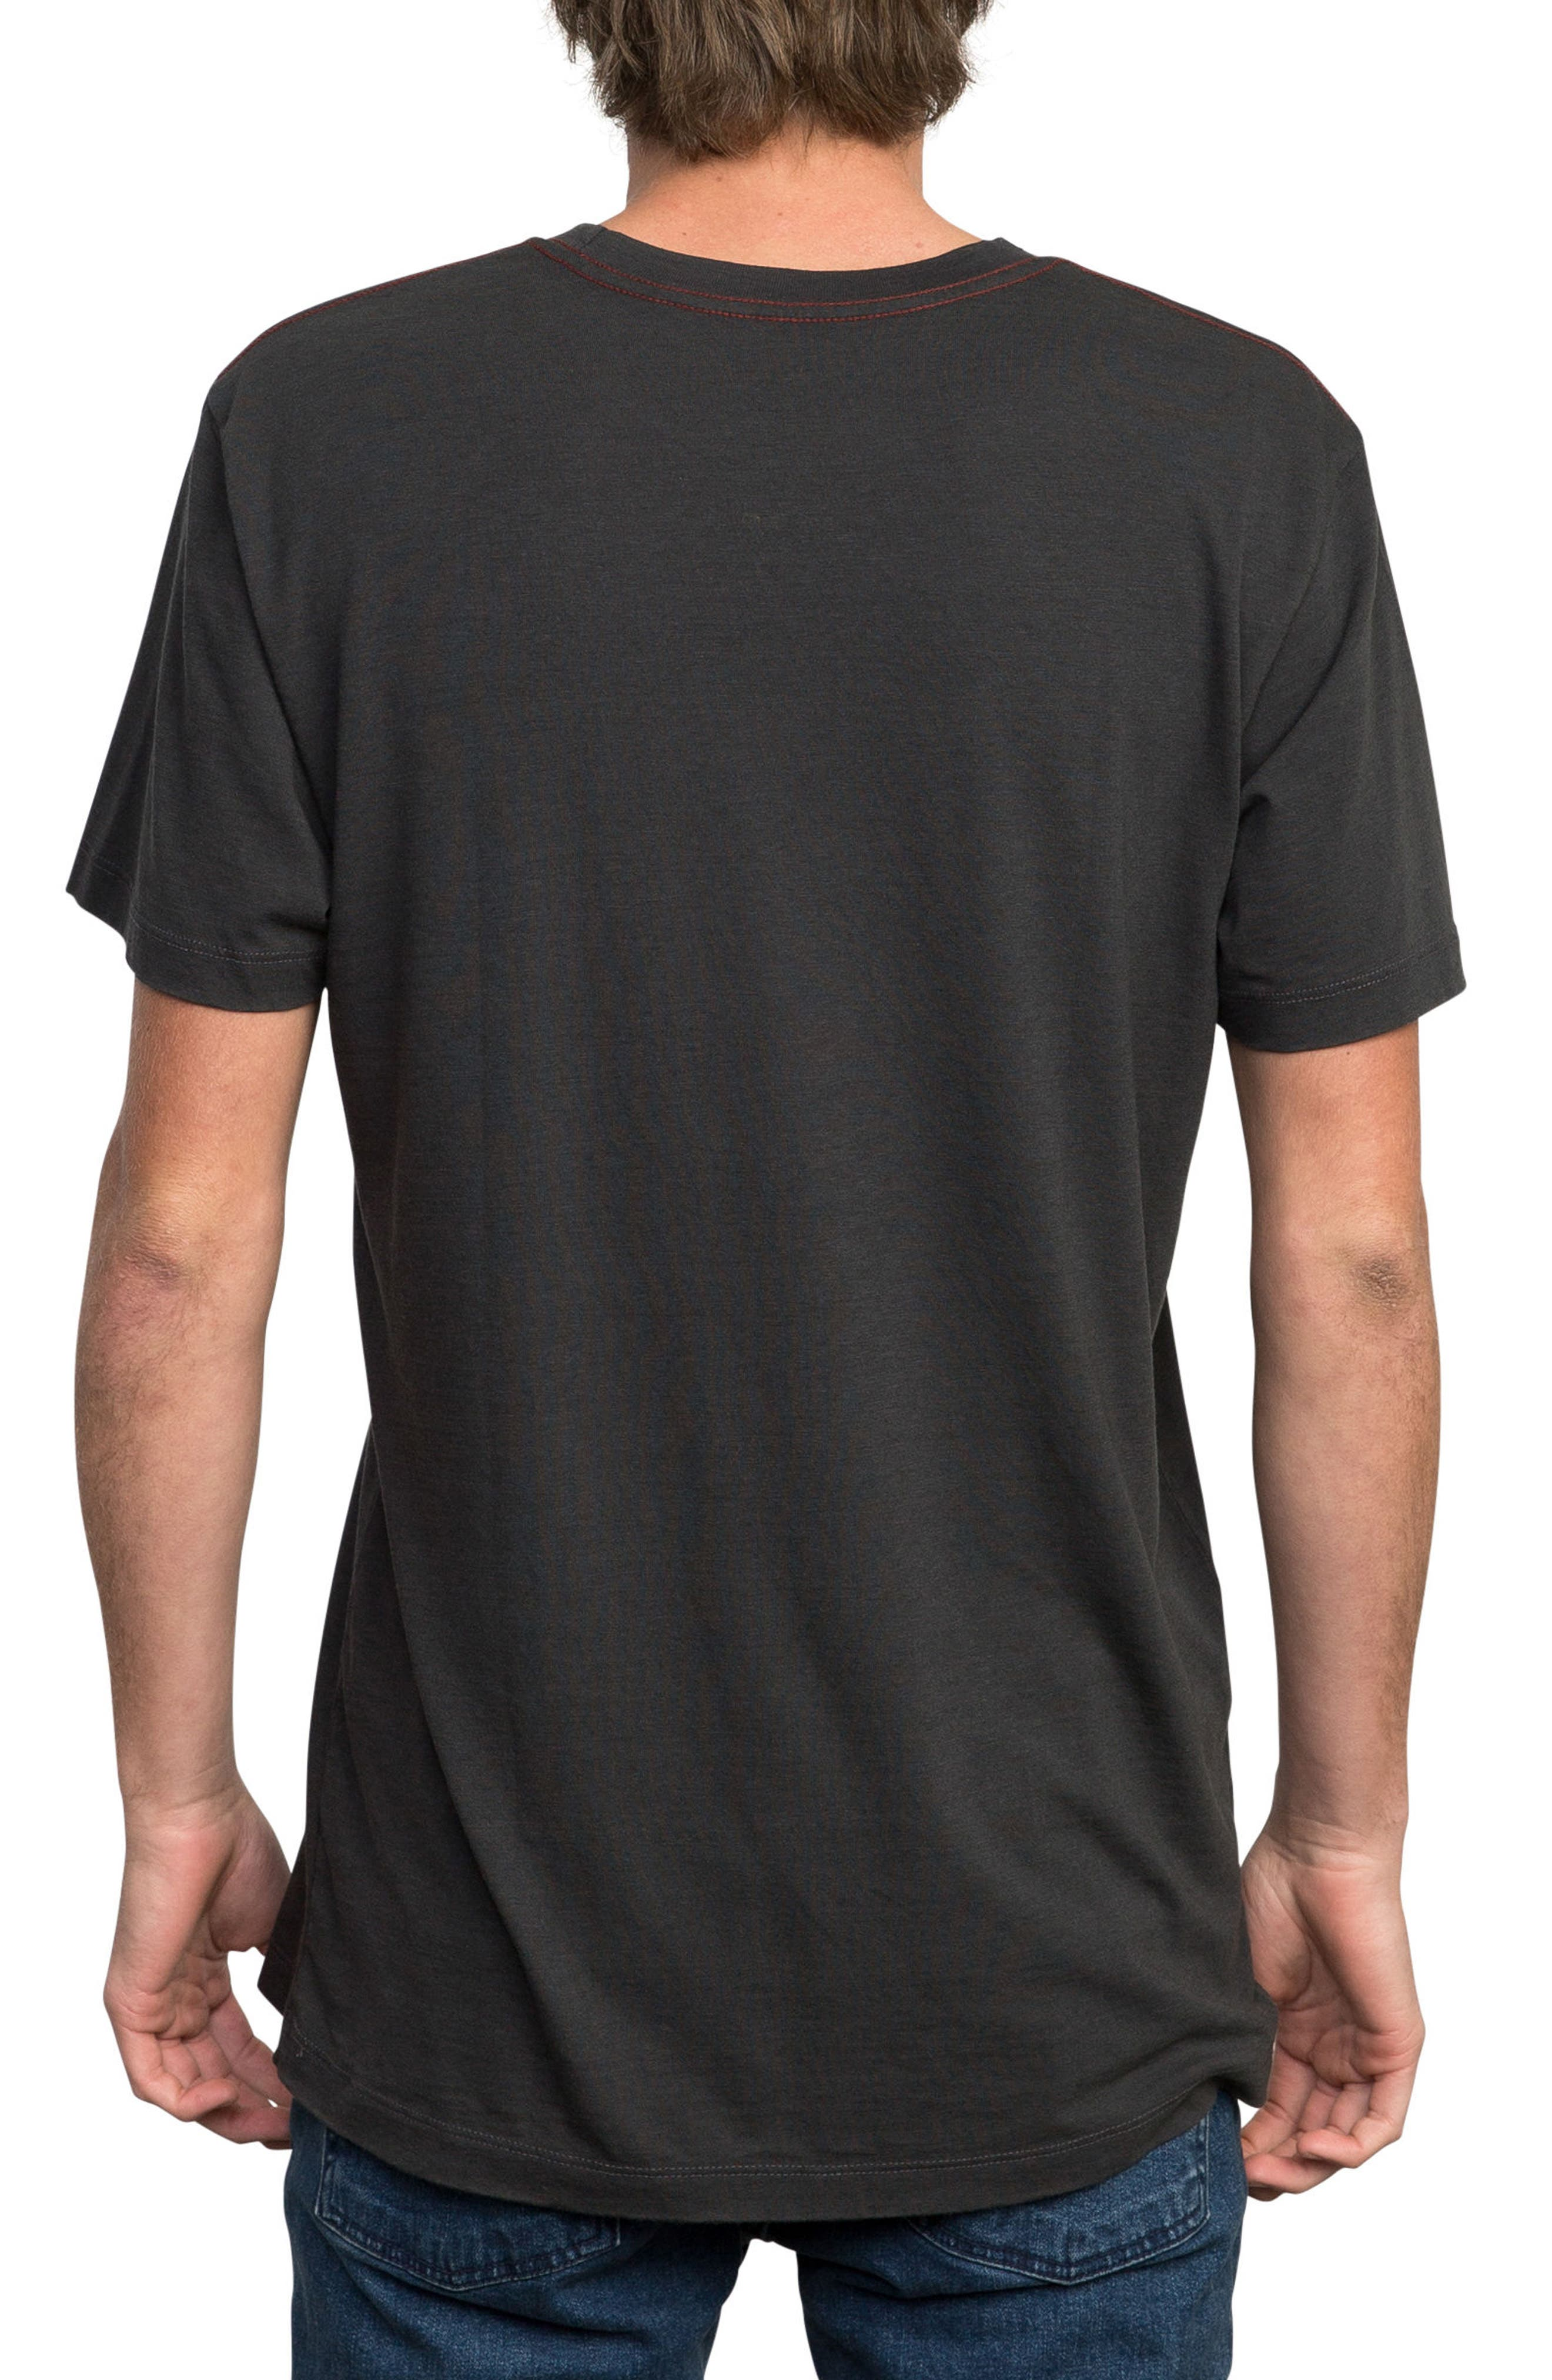 Blade Graphic T-Shirt,                             Alternate thumbnail 2, color,                             PIRATE BLACK